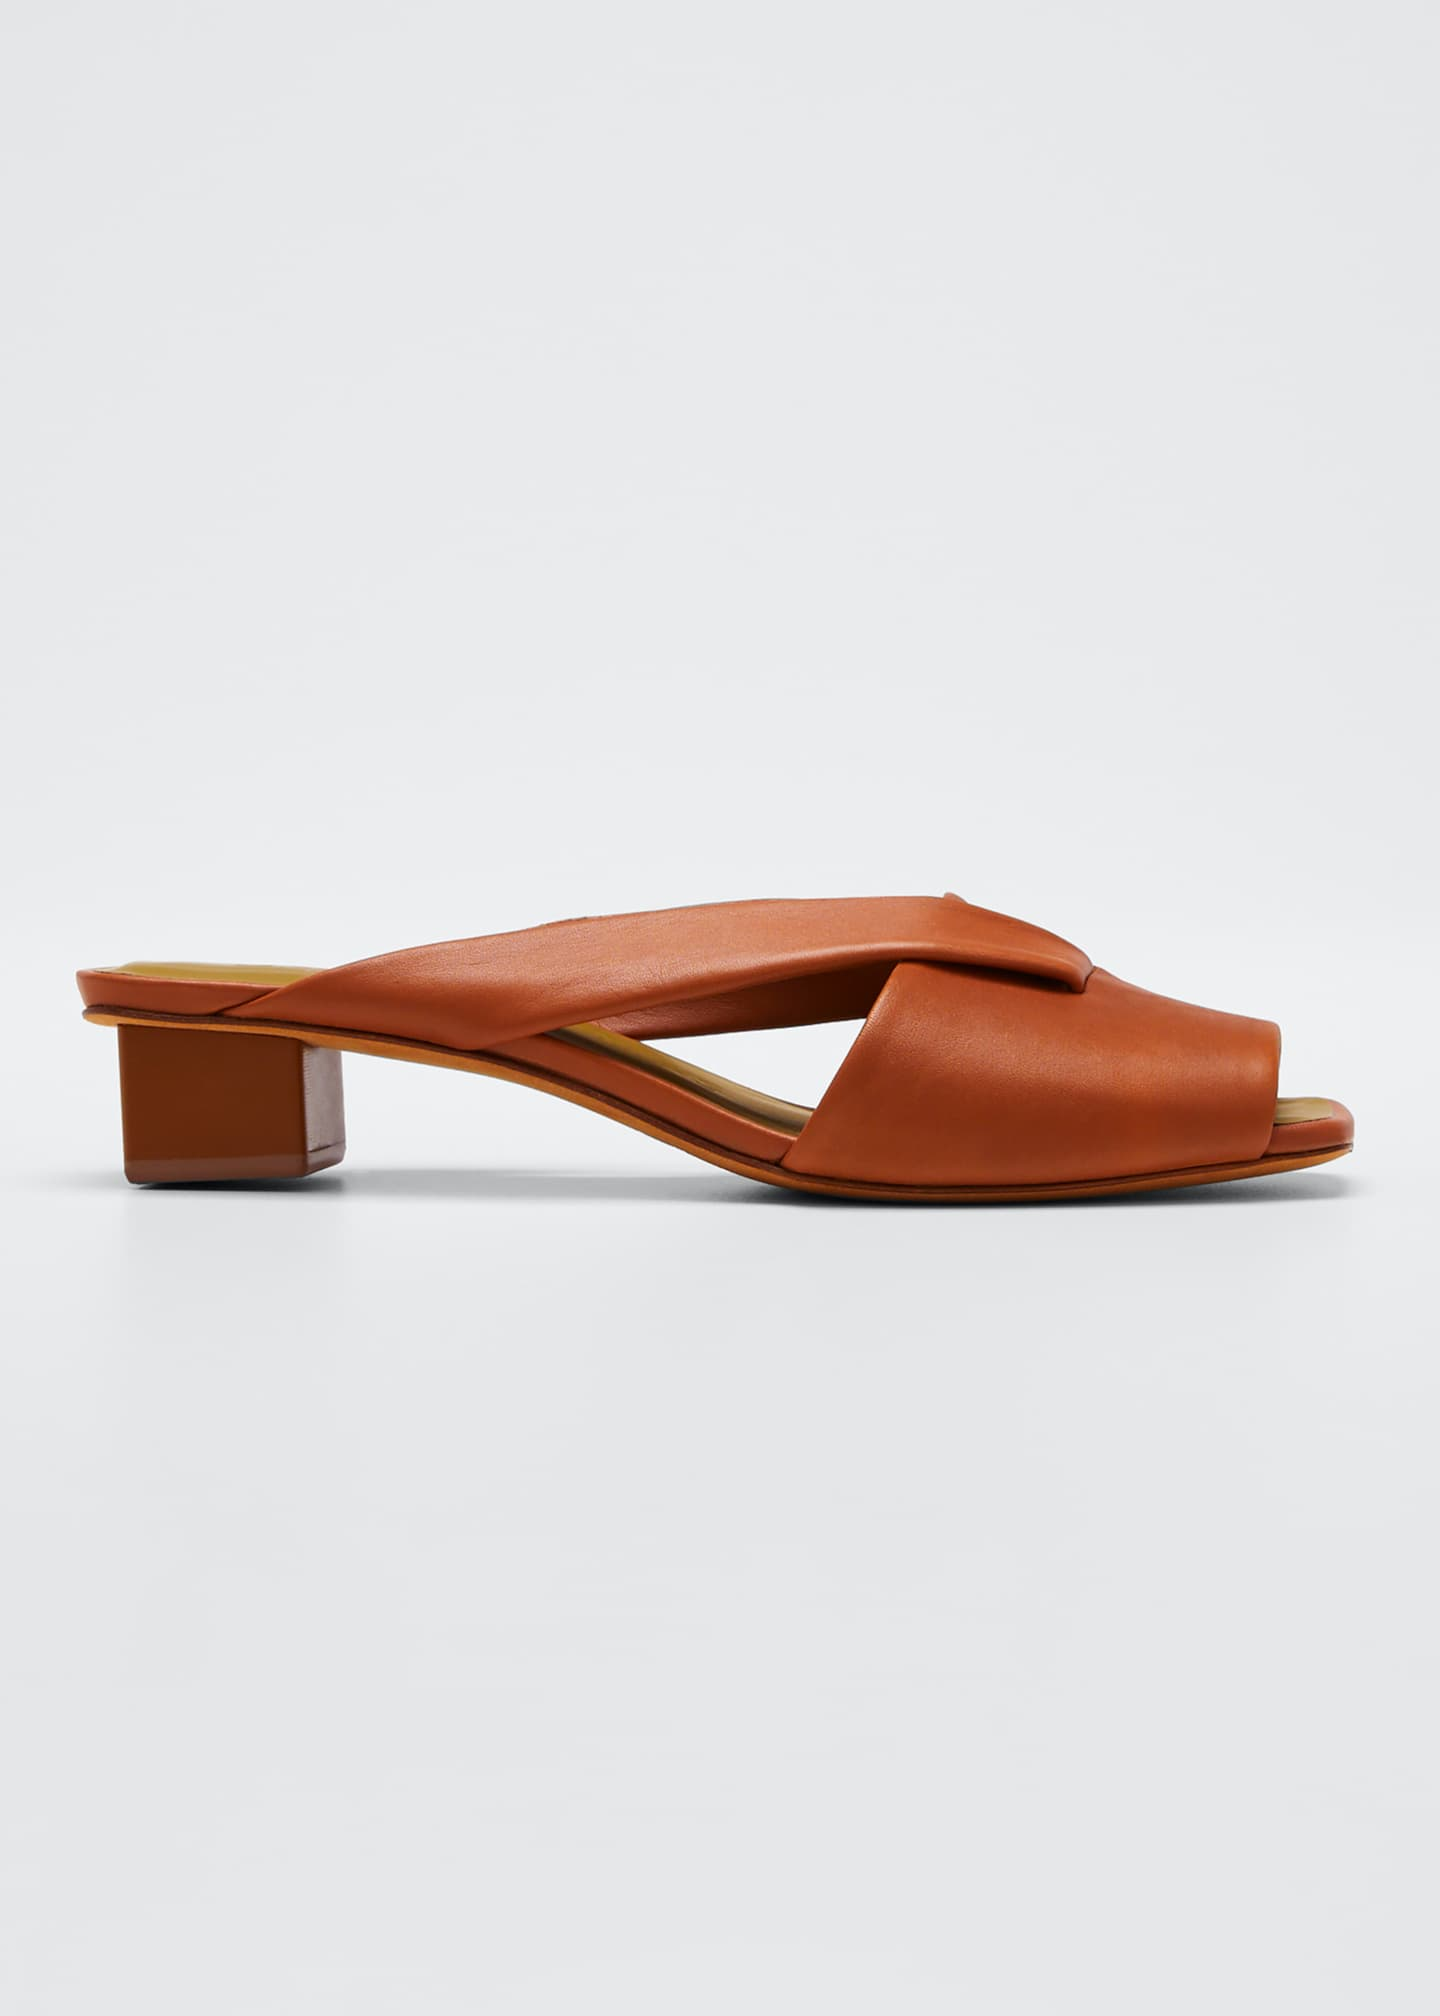 Gray Matters Loop Slide Leather Sandals, Brown